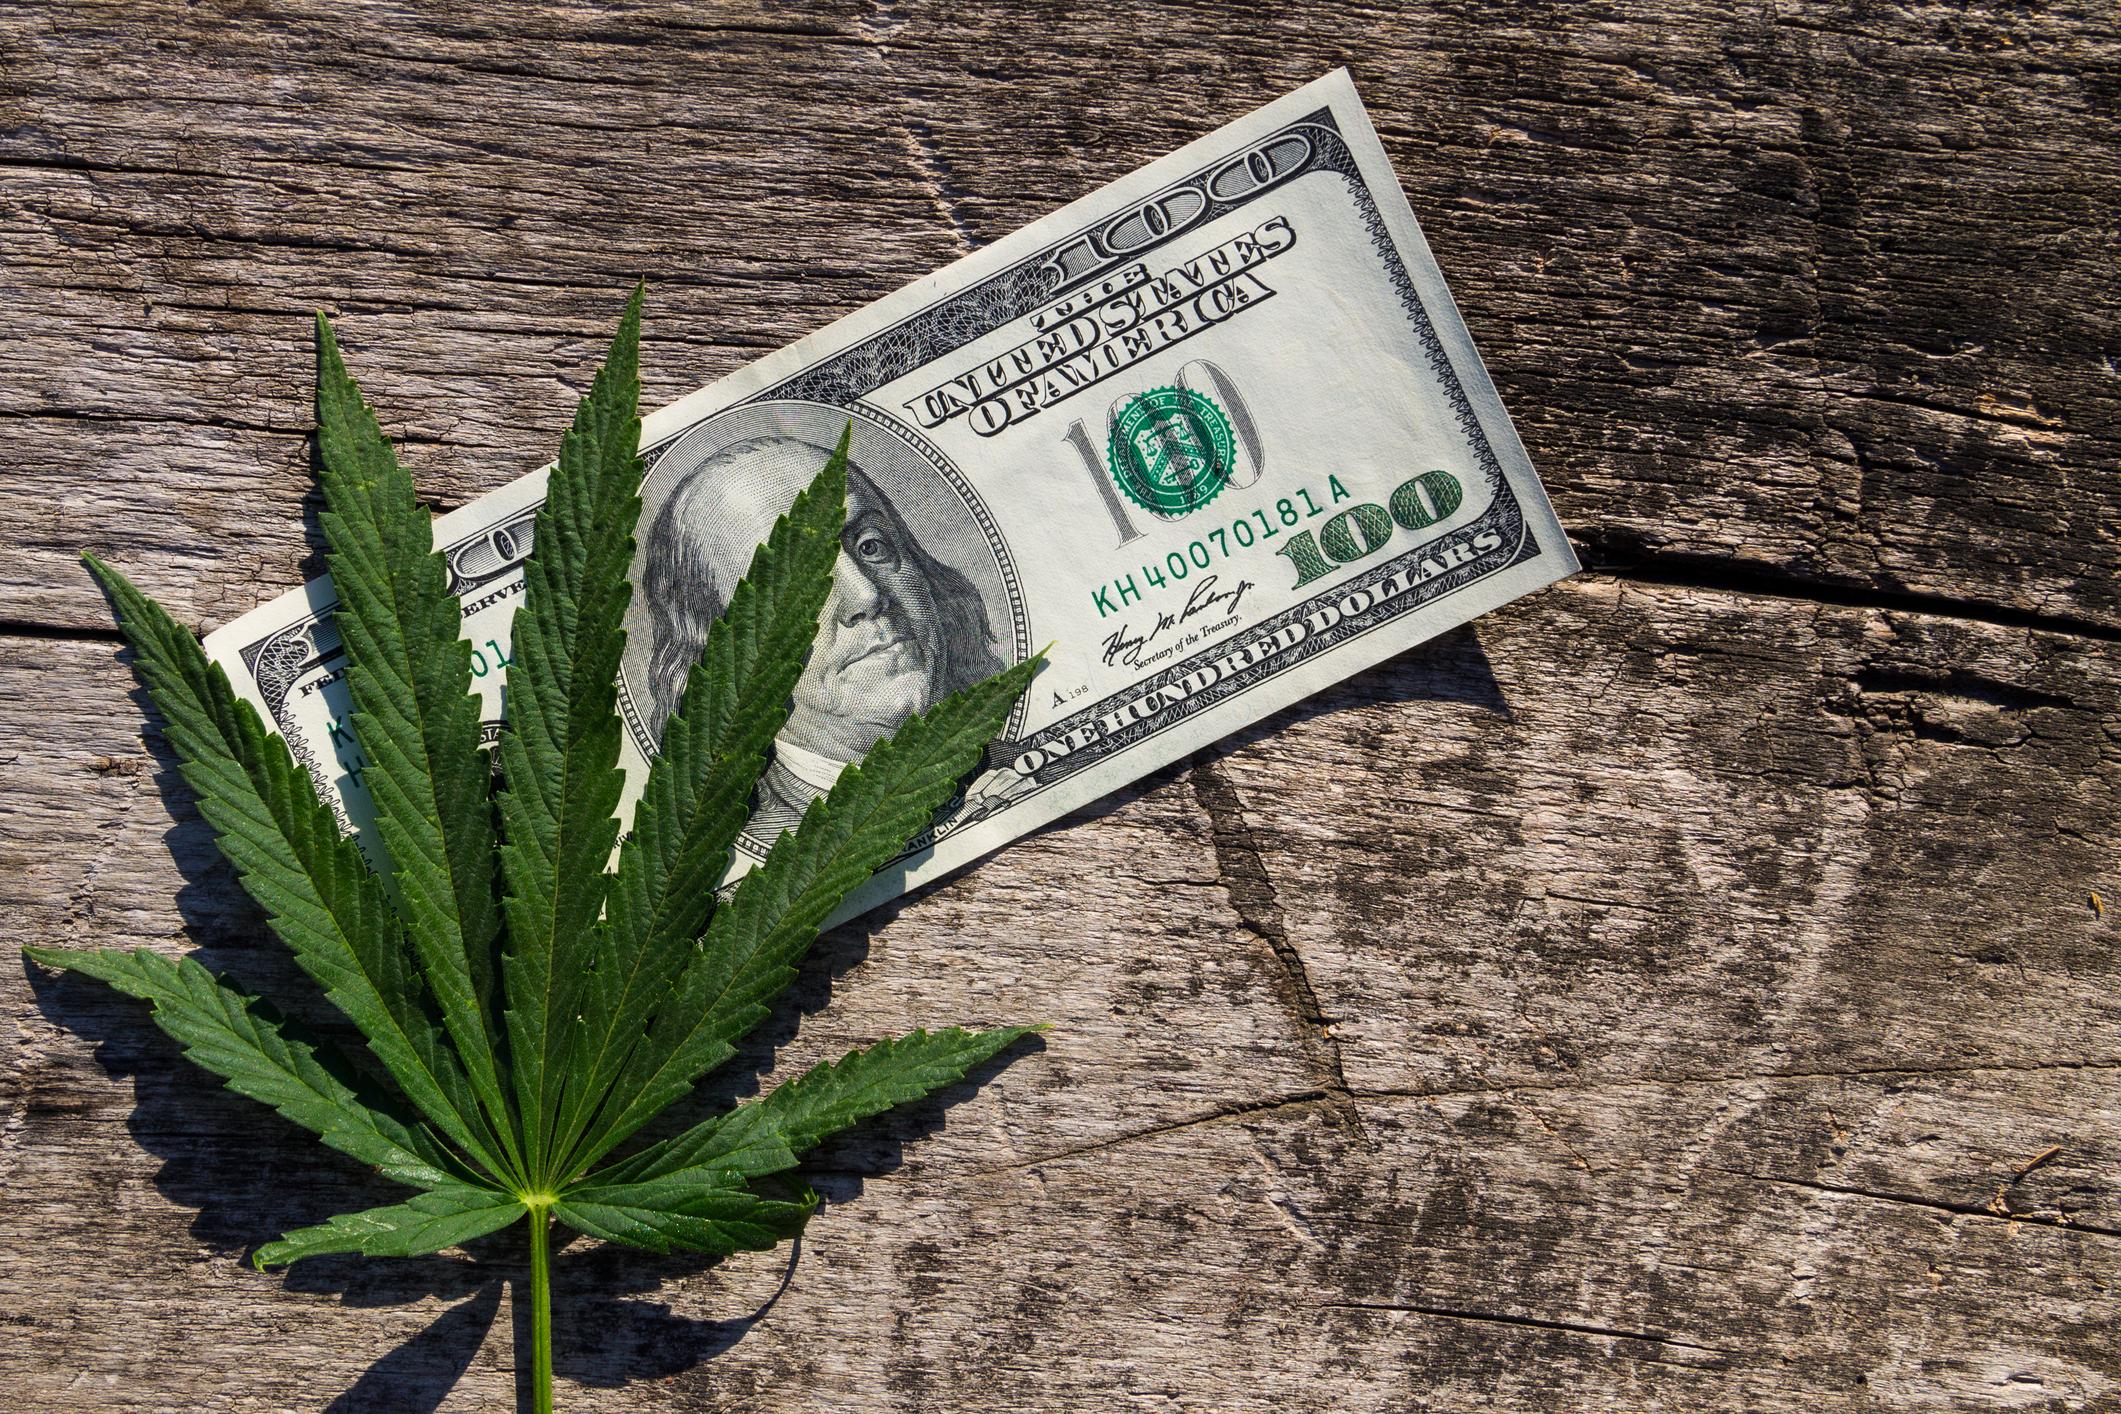 Pot leaf and a hundred dollar bill.